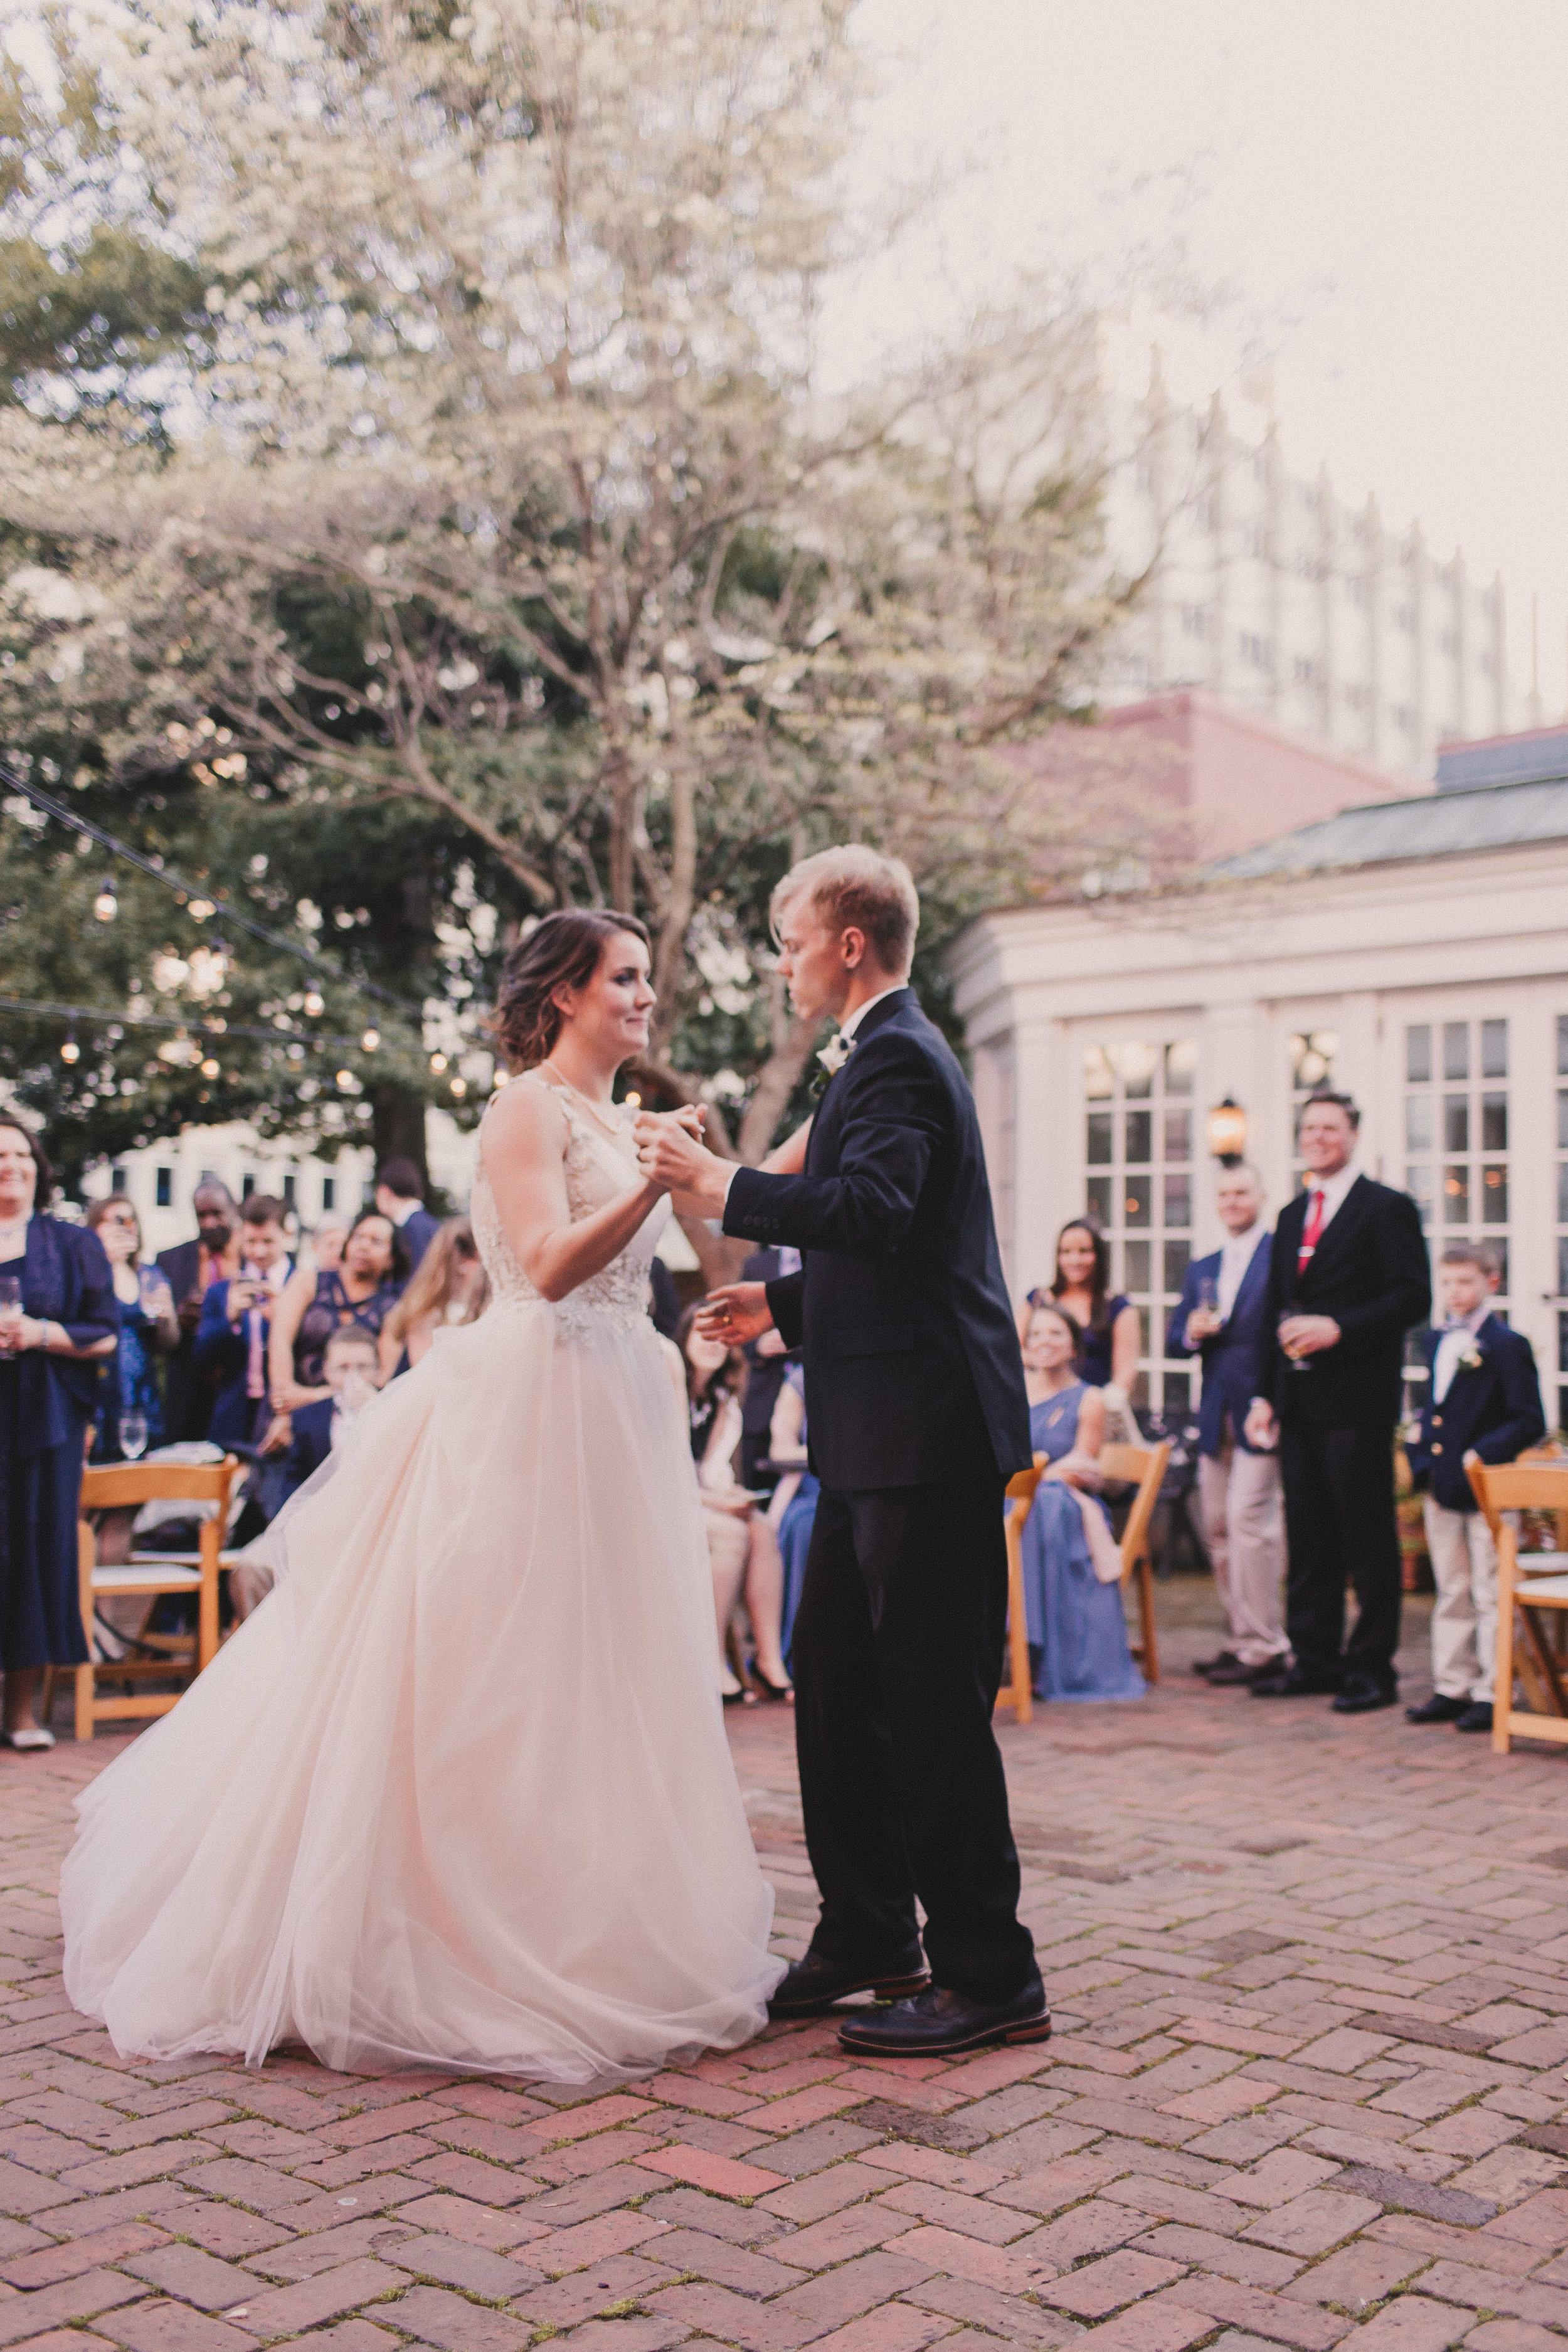 Lindsey & Bert - Wedding 4.1.17-780.jpg